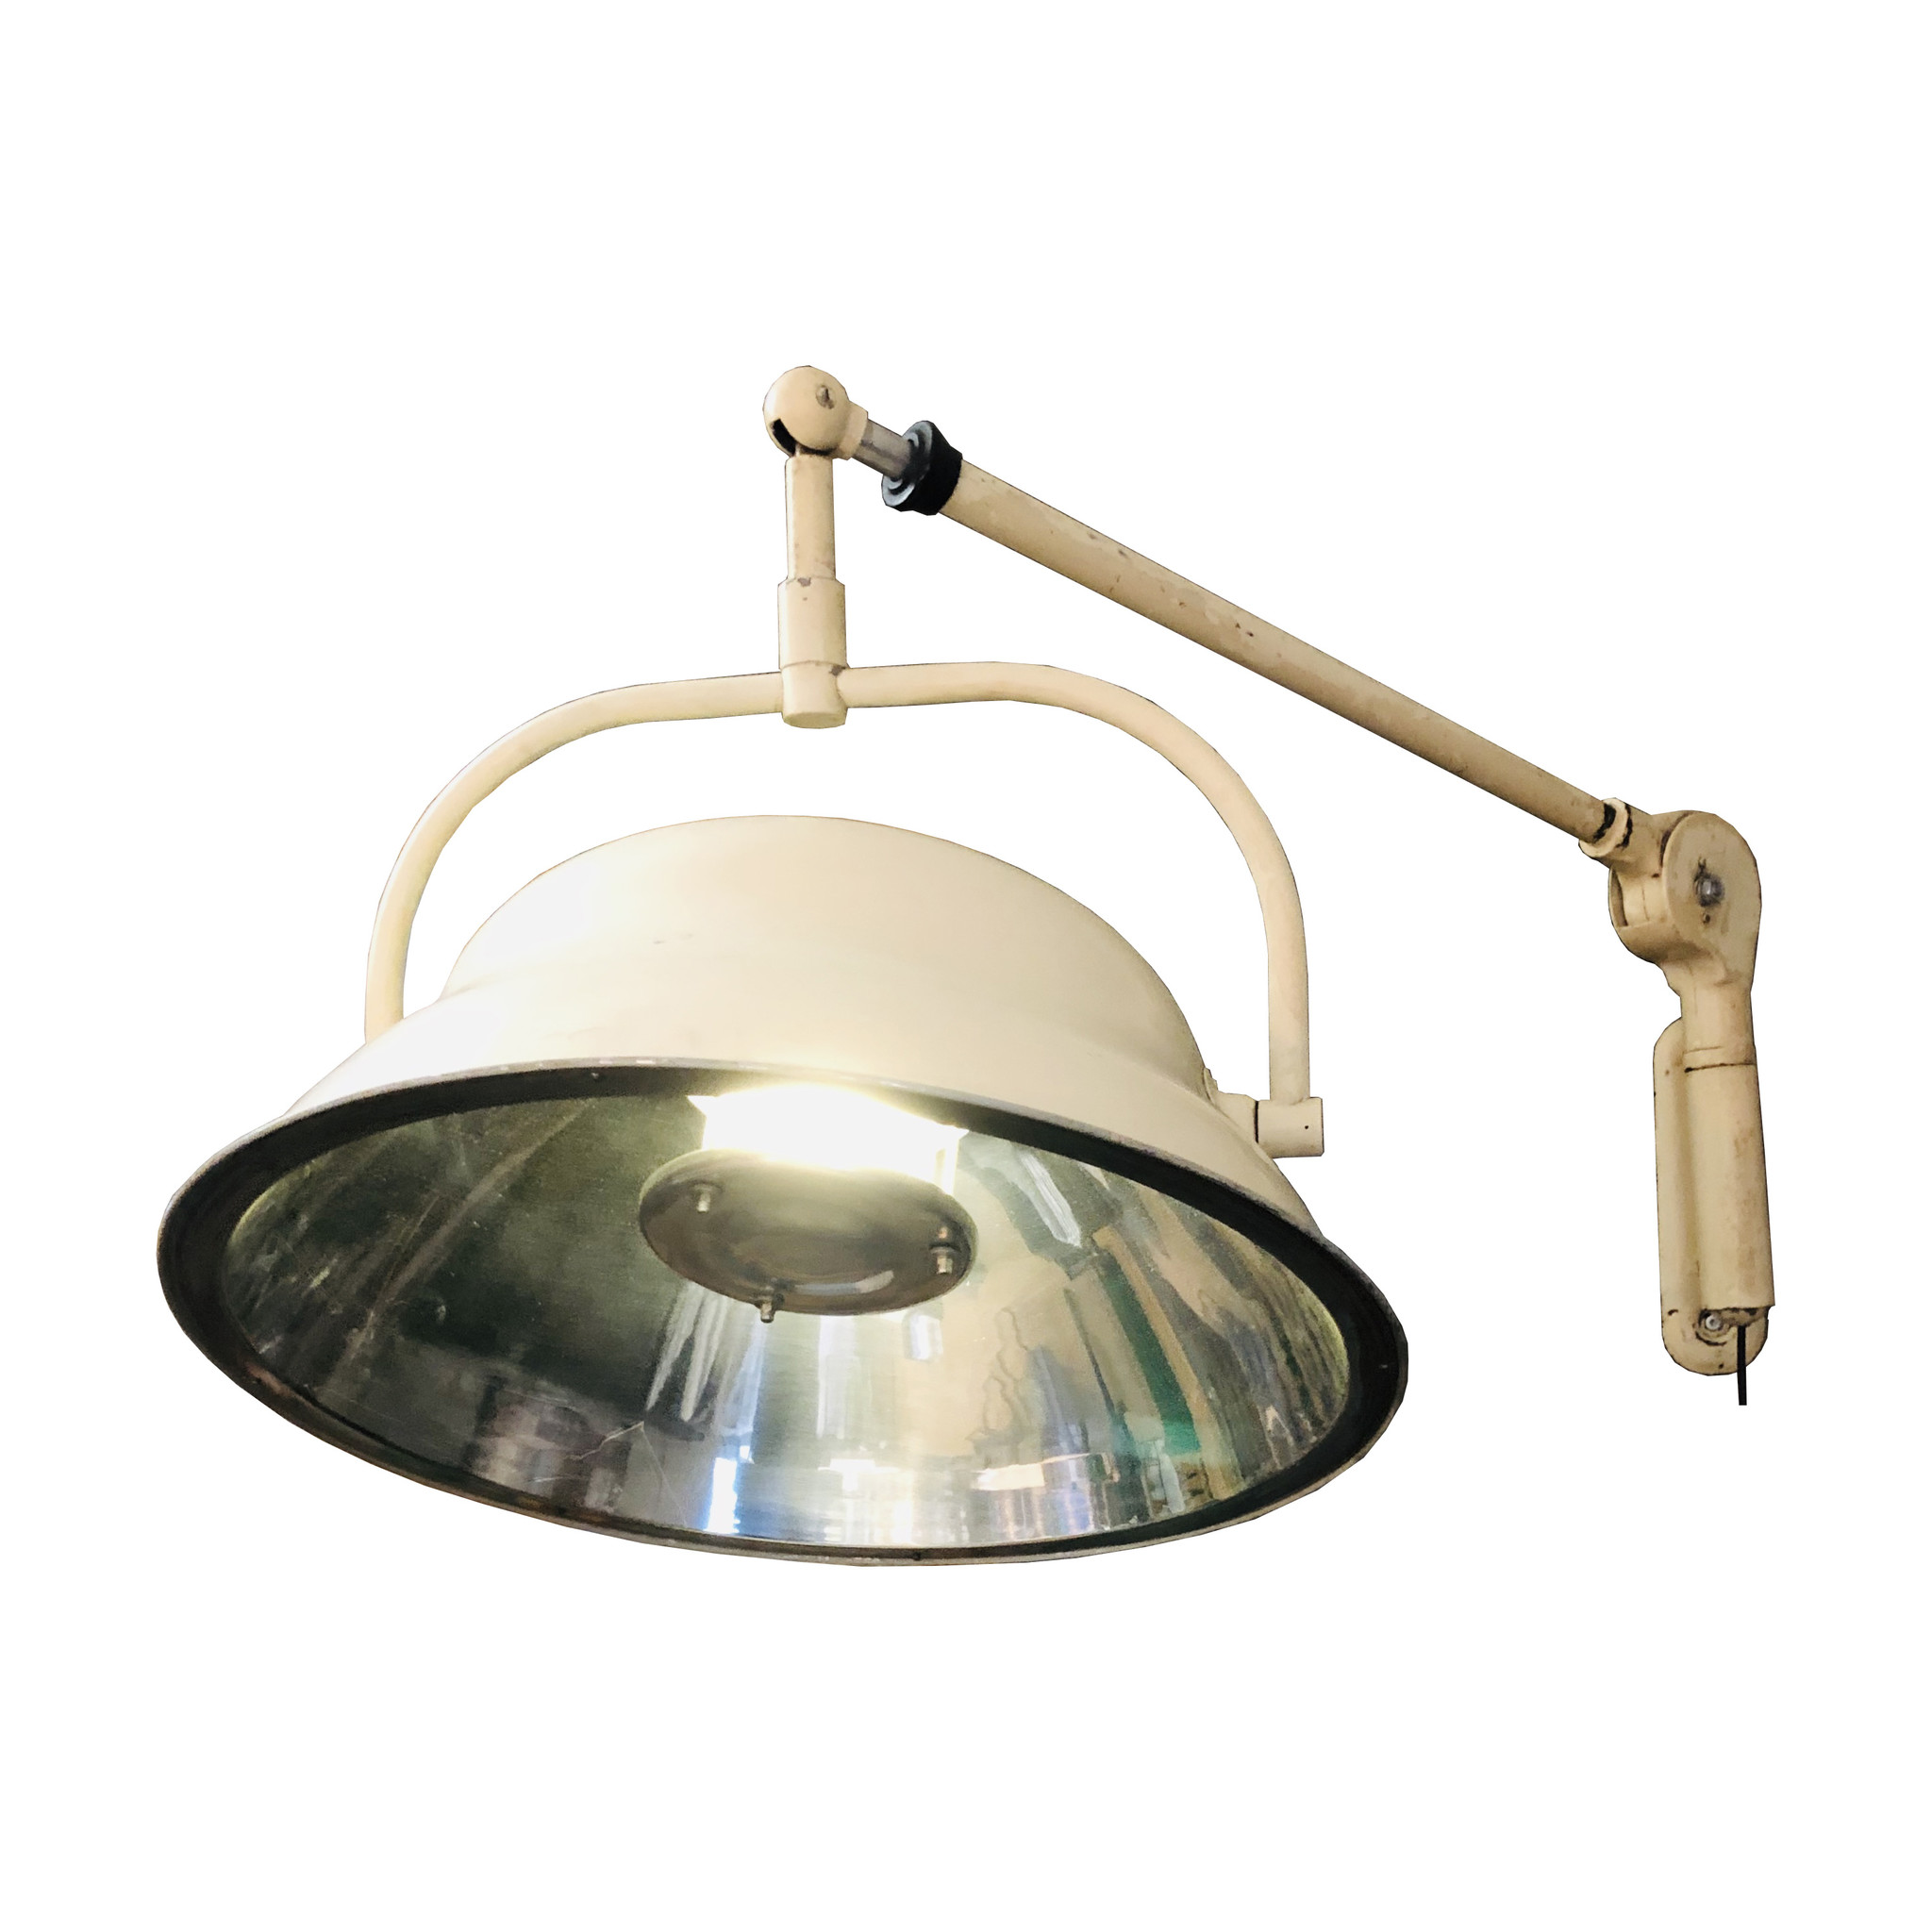 vintage operatielamp